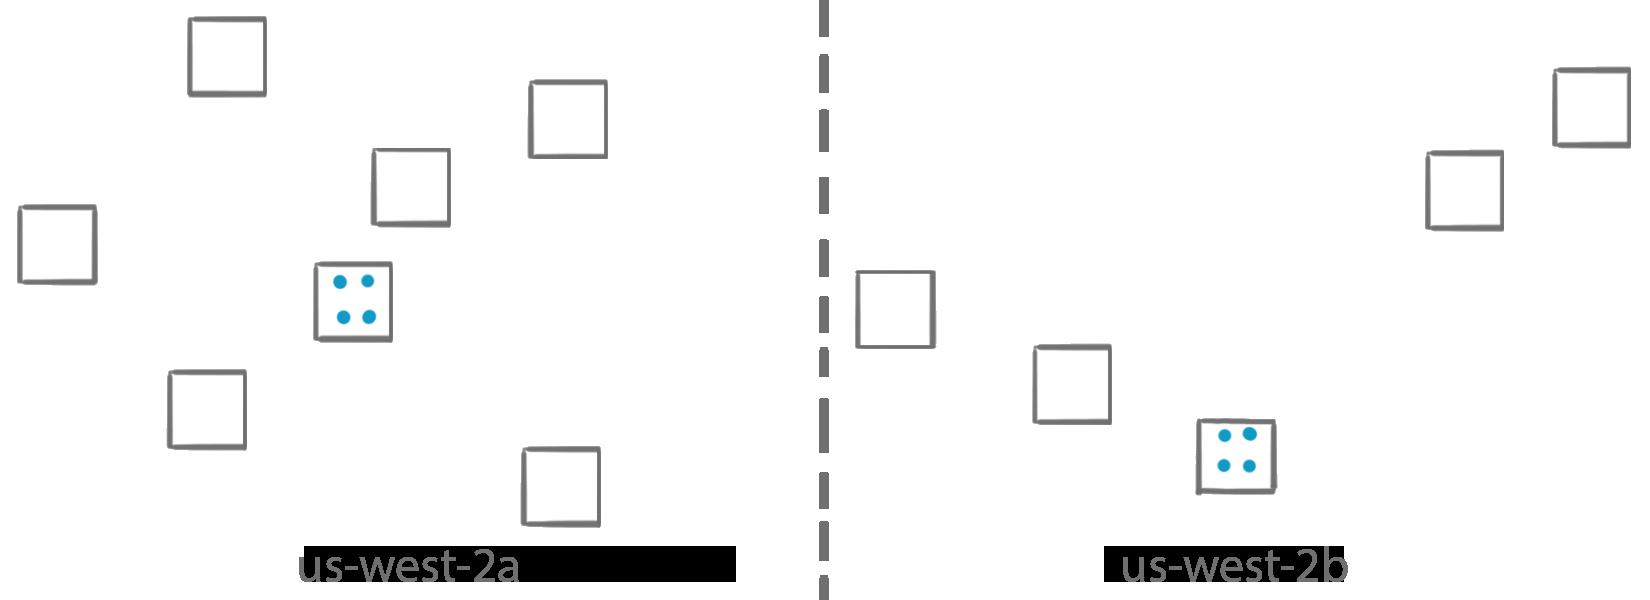 Placement binpack spread